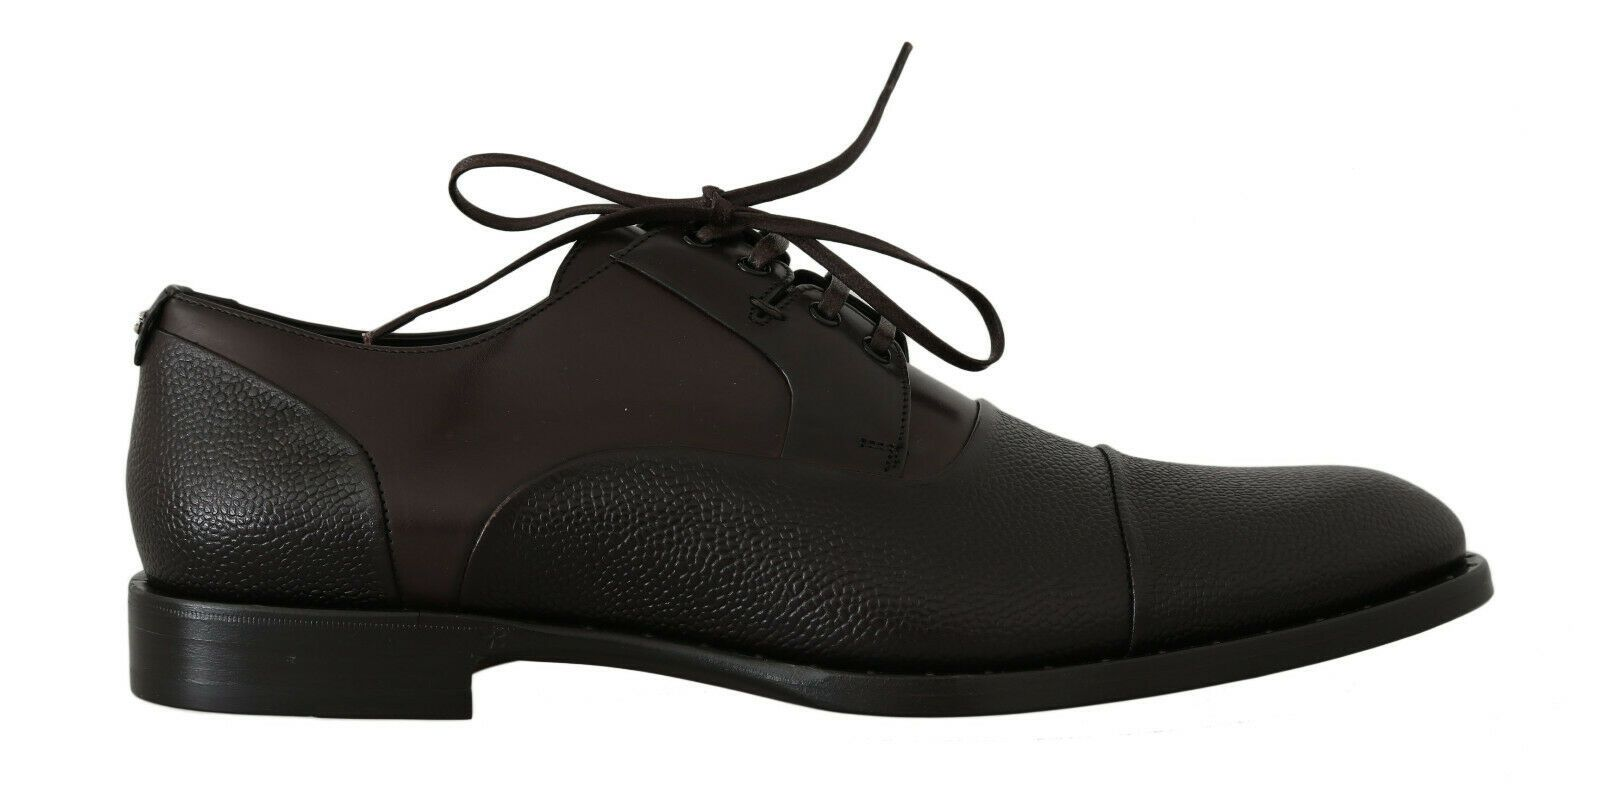 Dolce & Gabbana Men's Leather Laceups Derby Shoes Brown MV2279 - EU39/US6